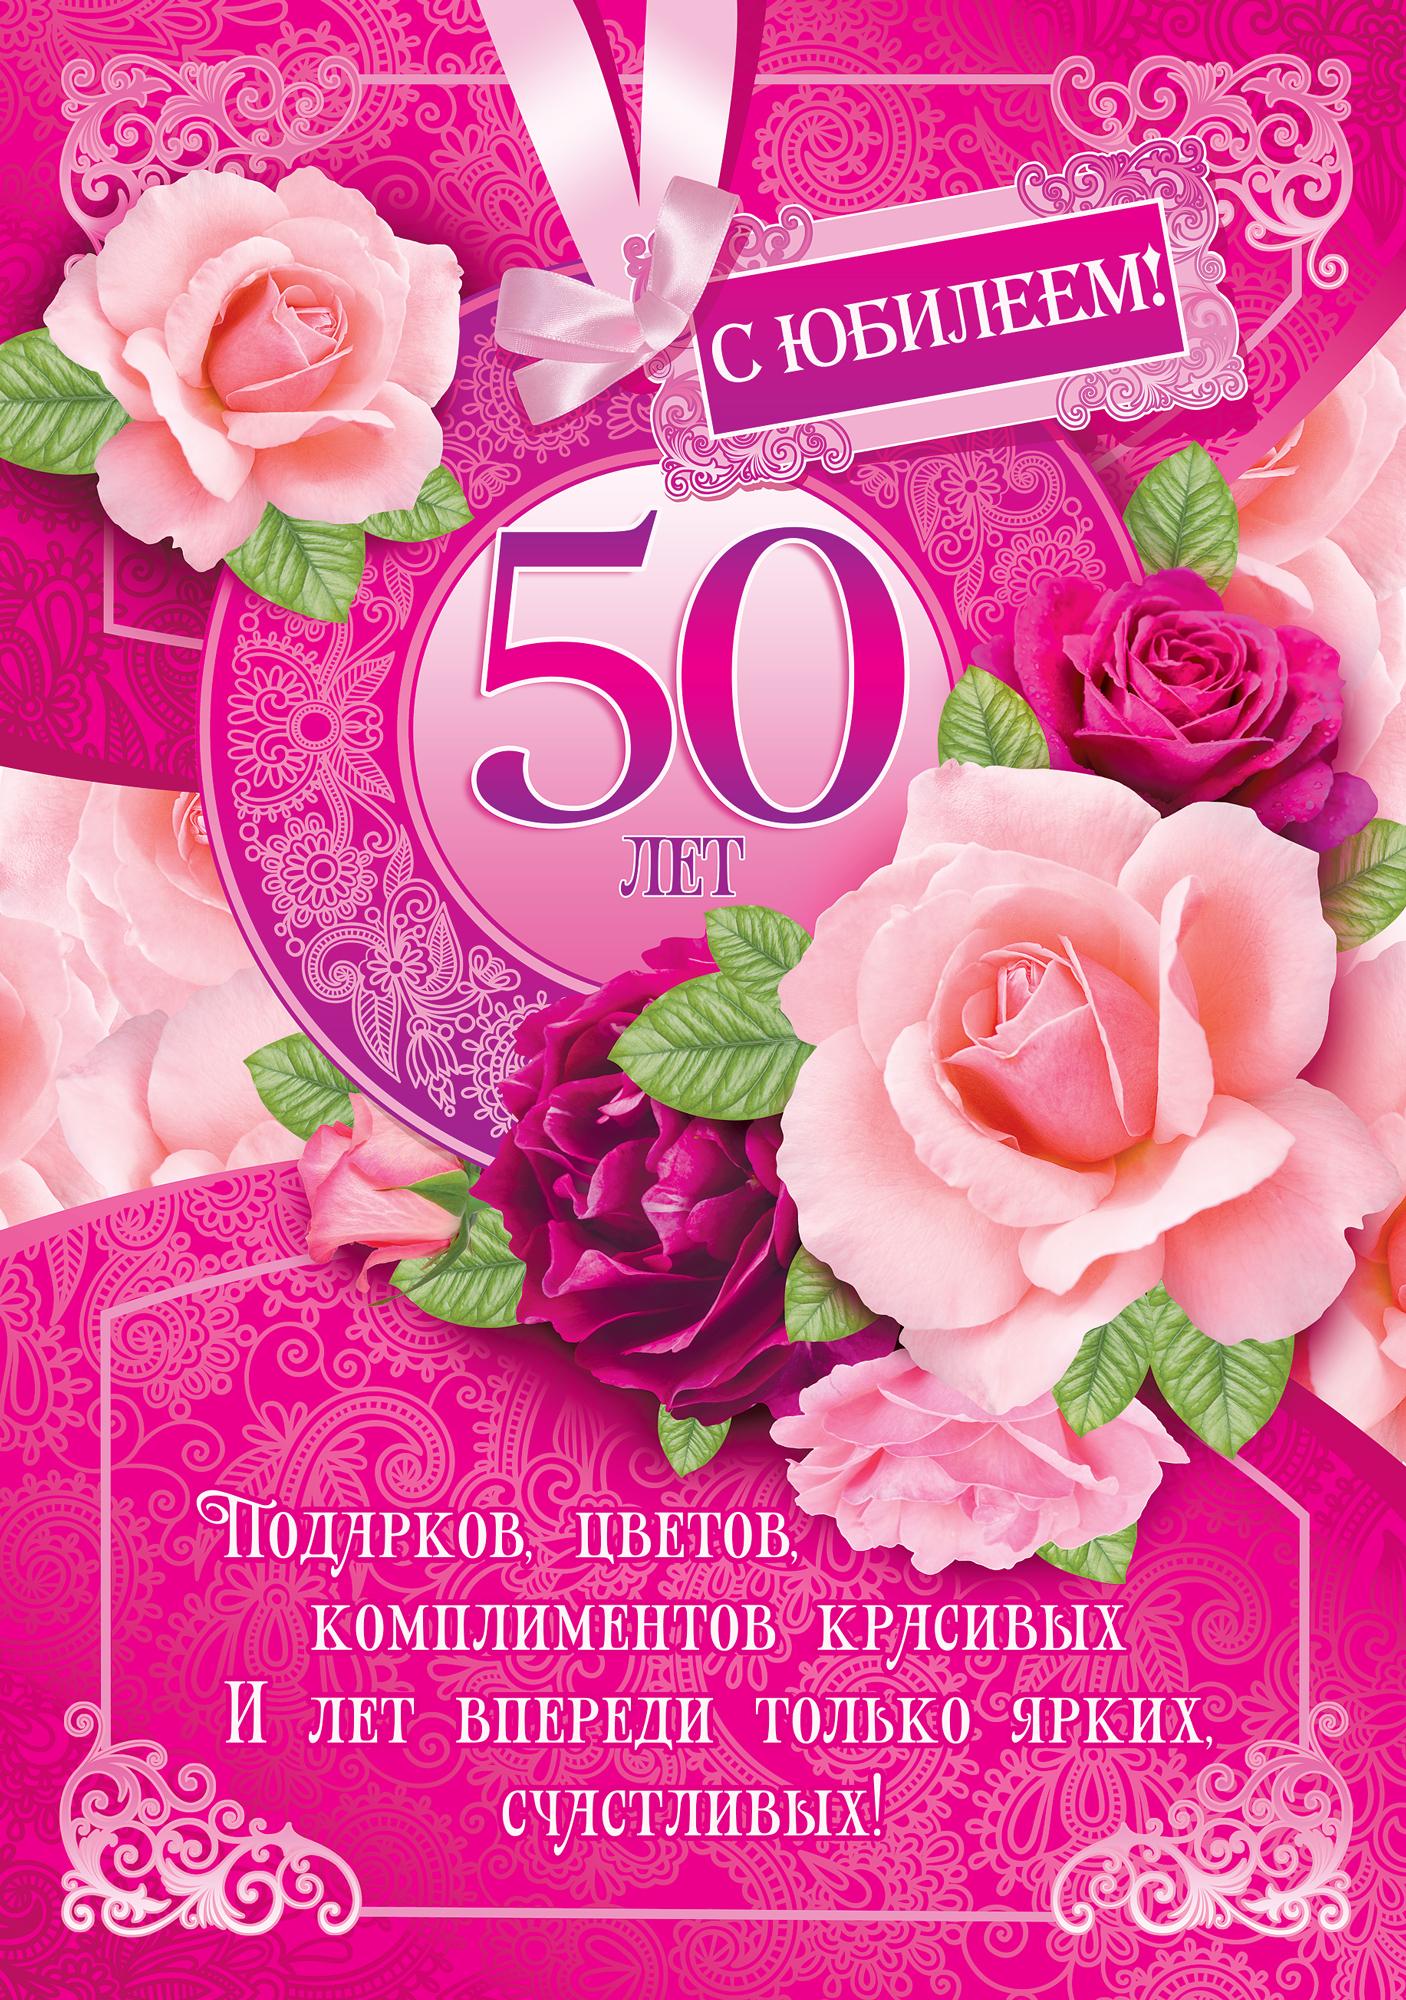 Цветок на открытке 36